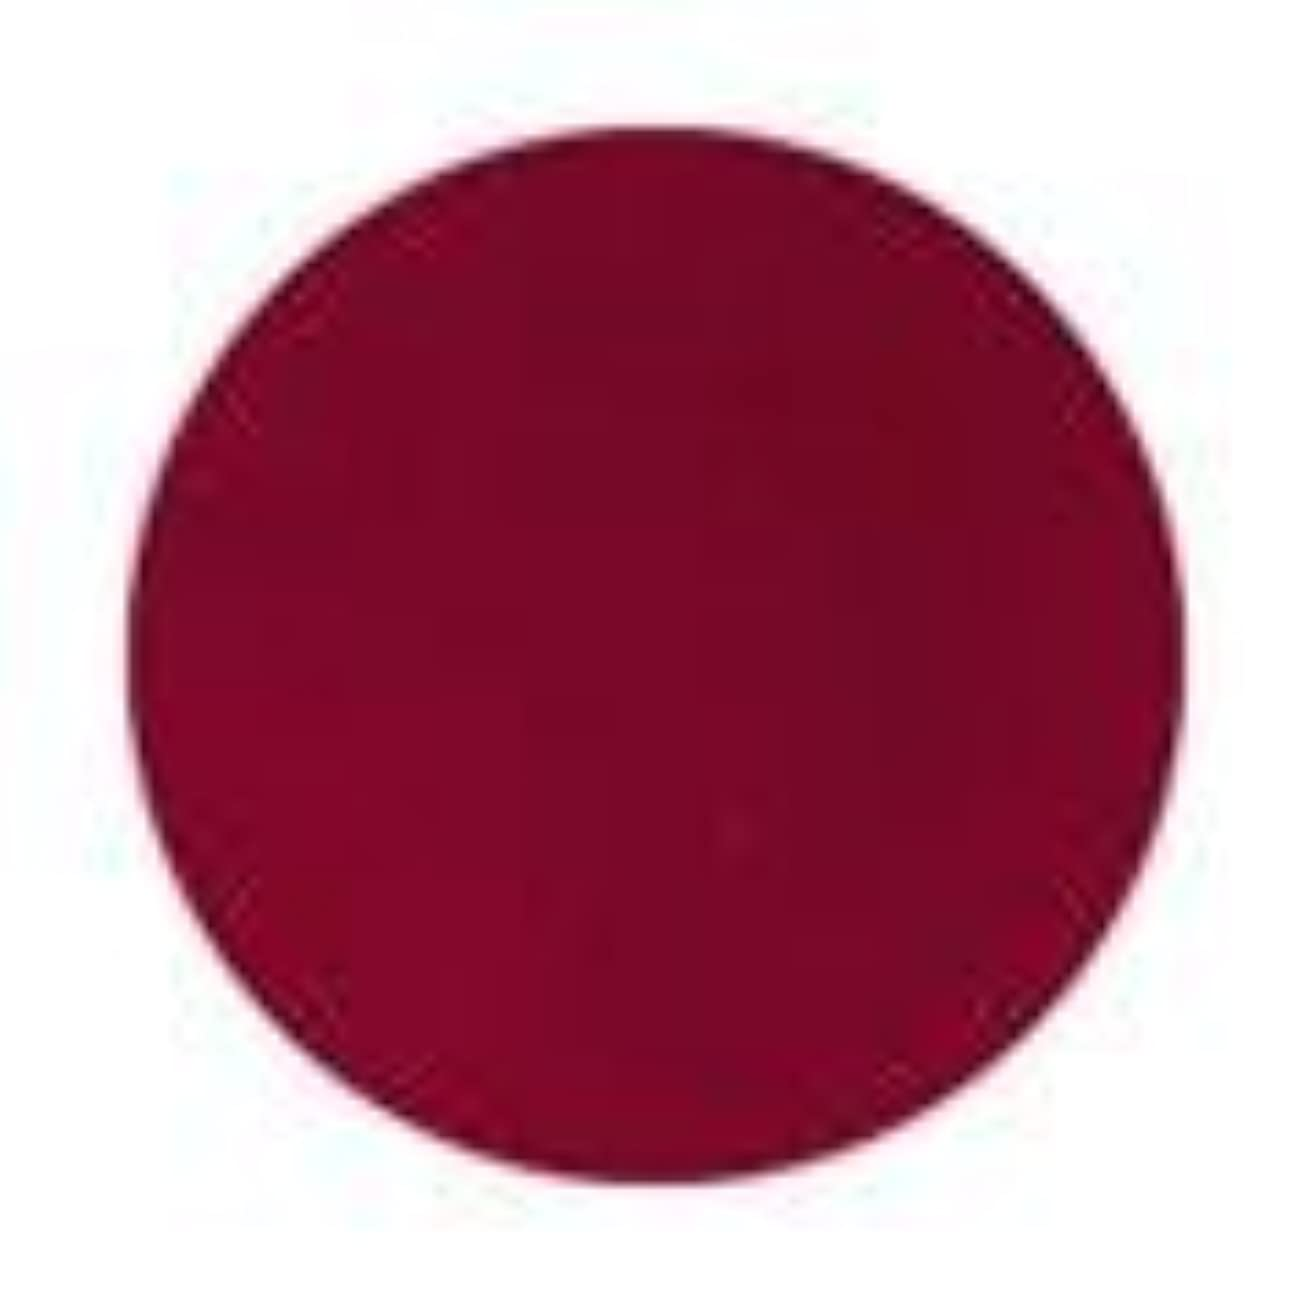 Jessica ジェレレーション カラー 15ml  222 ウインターベリー